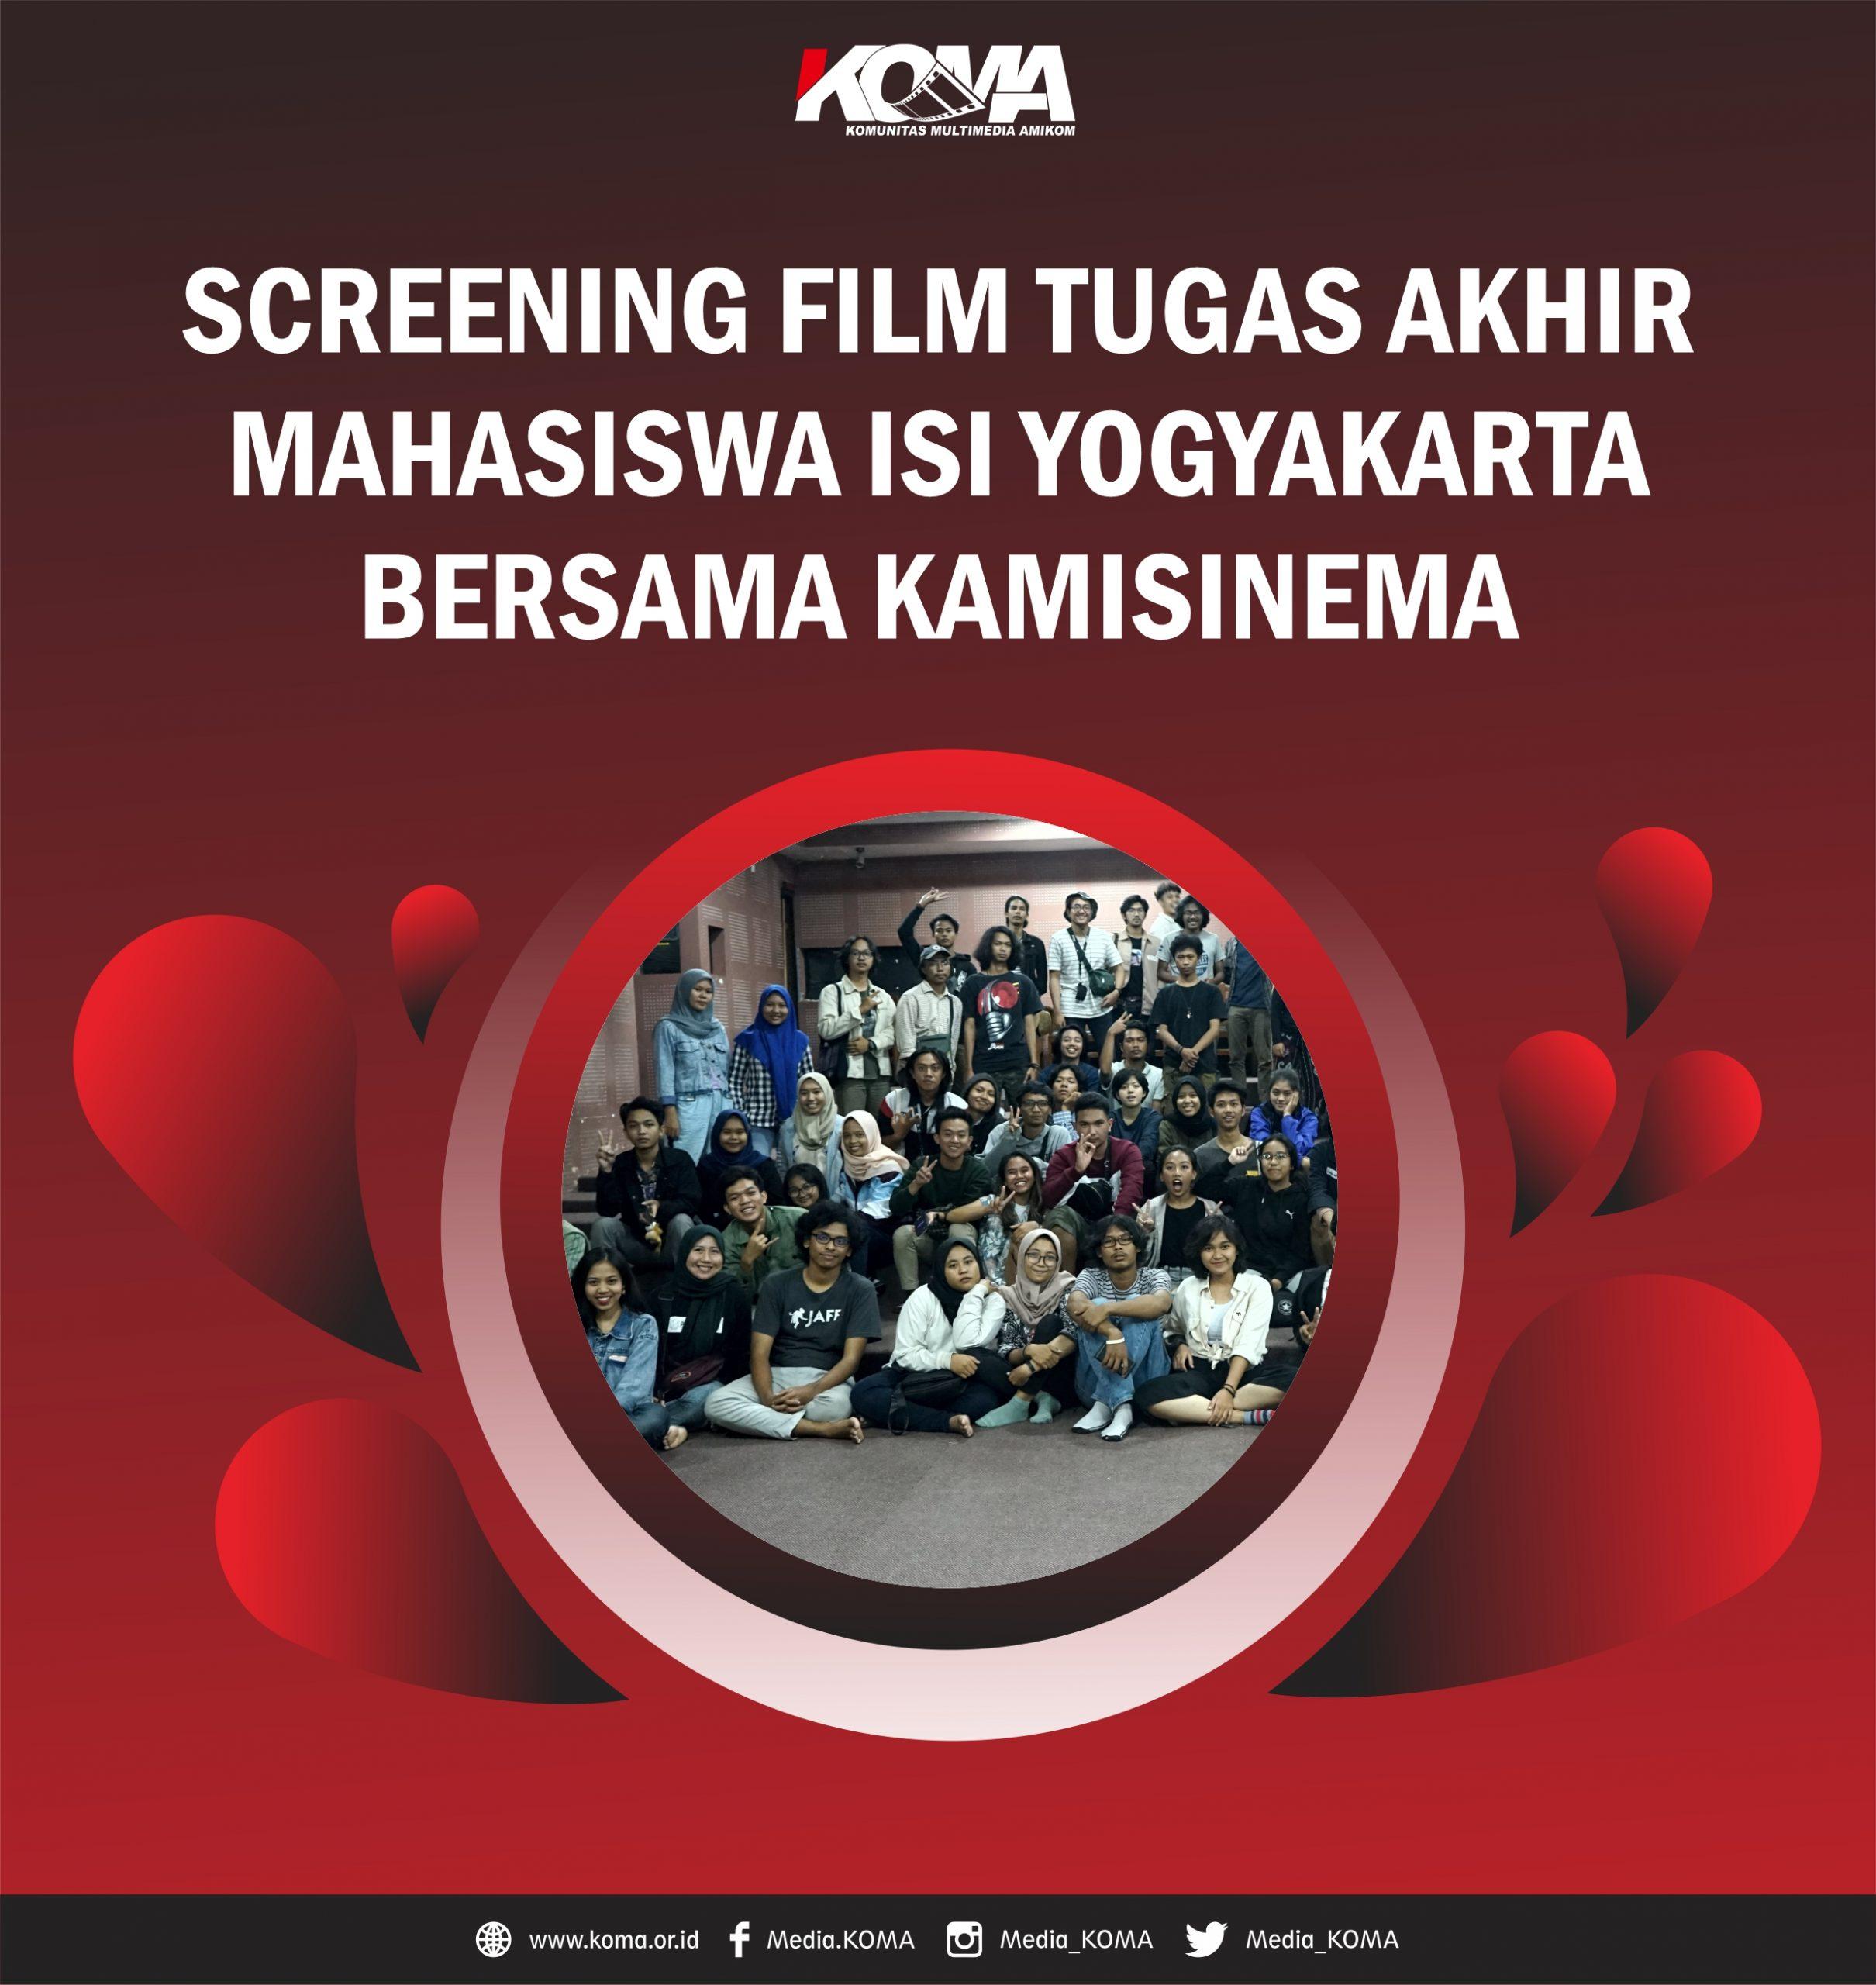 Screening-Film-Tugas-Akhir-ISI-Yogyakarta1